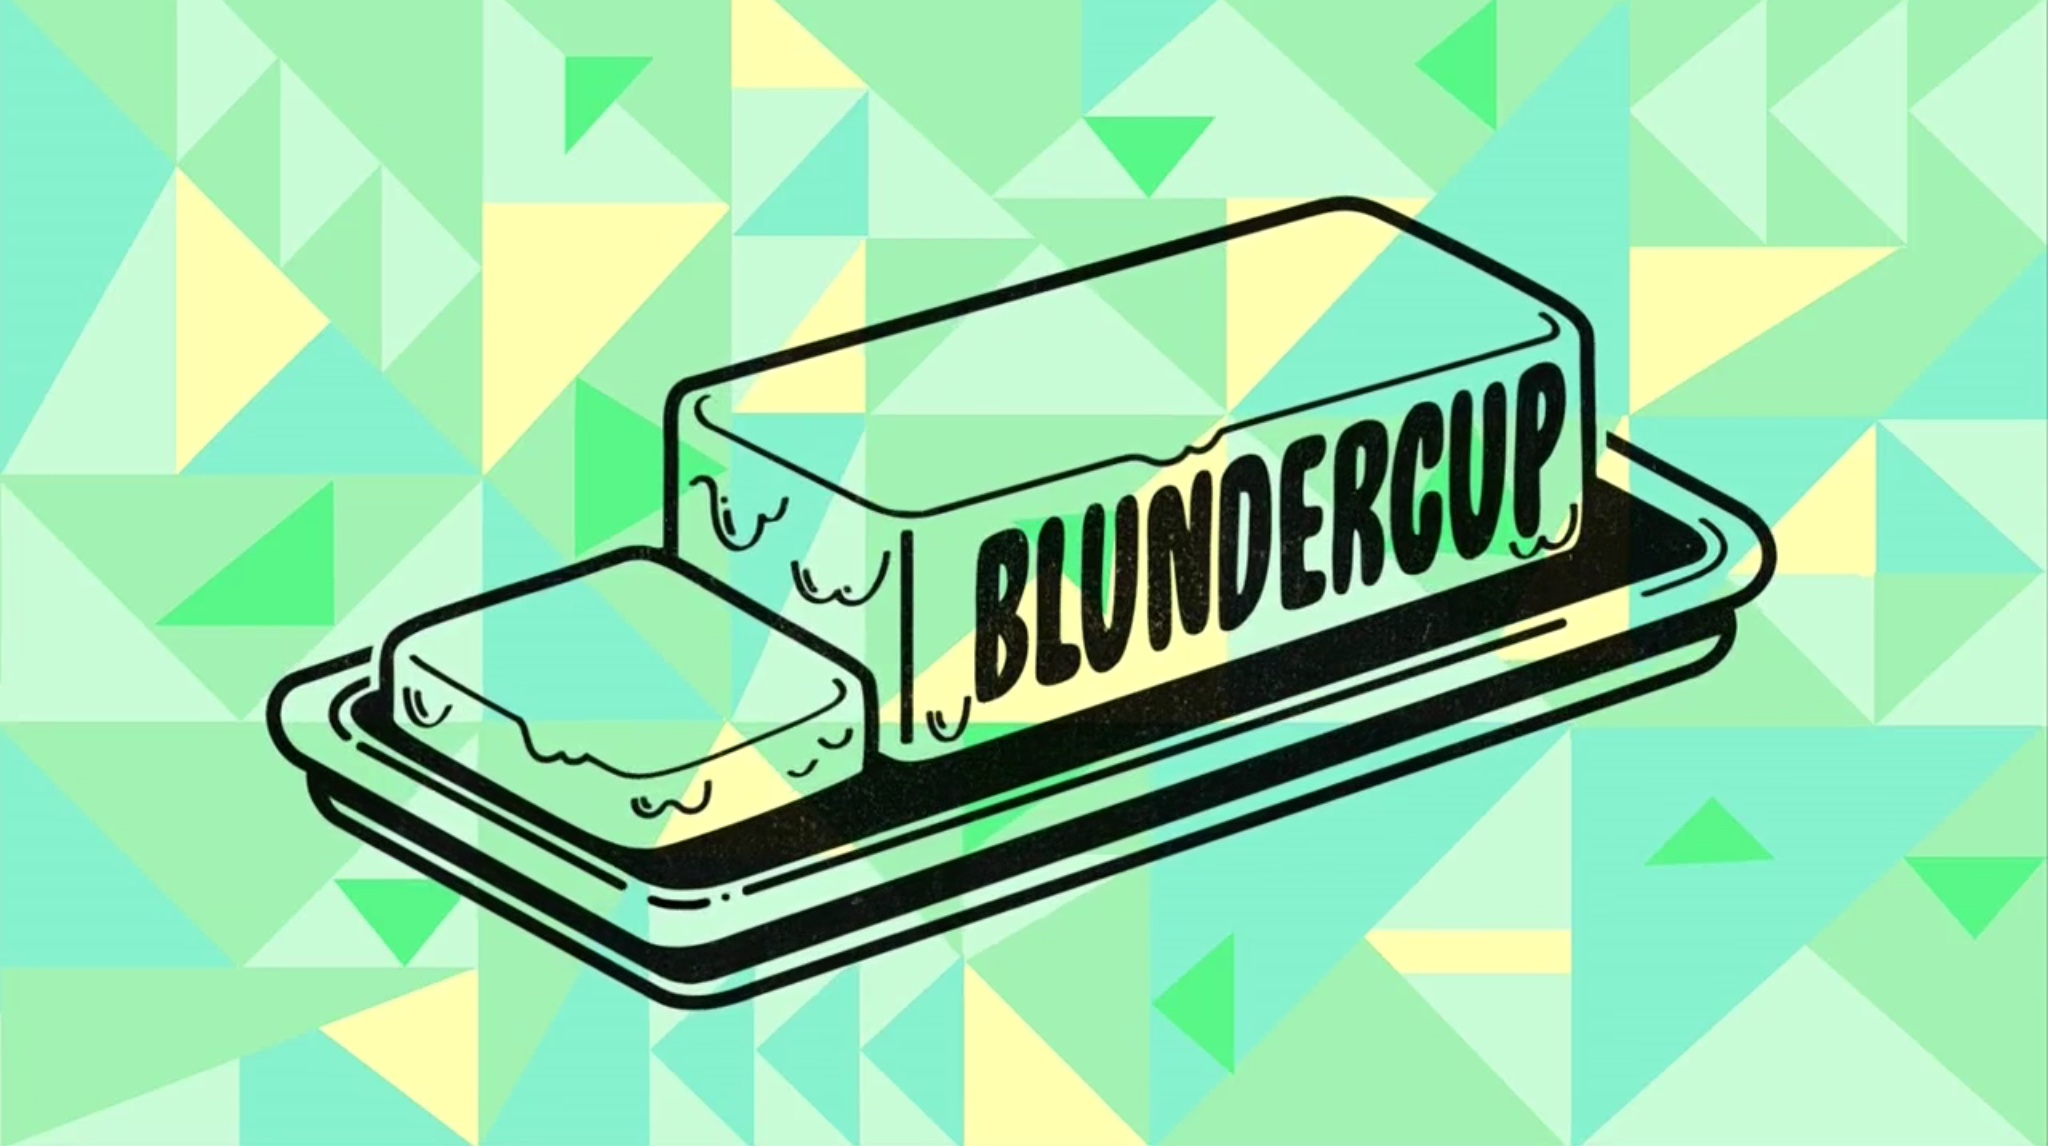 Blundercup